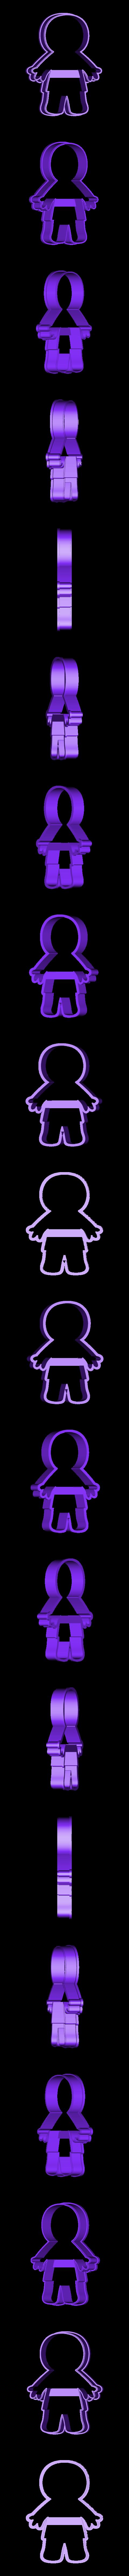 00613 mumia.obj Download OBJ file Mummy cookie cutter for professional • 3D printer design, gleblubin